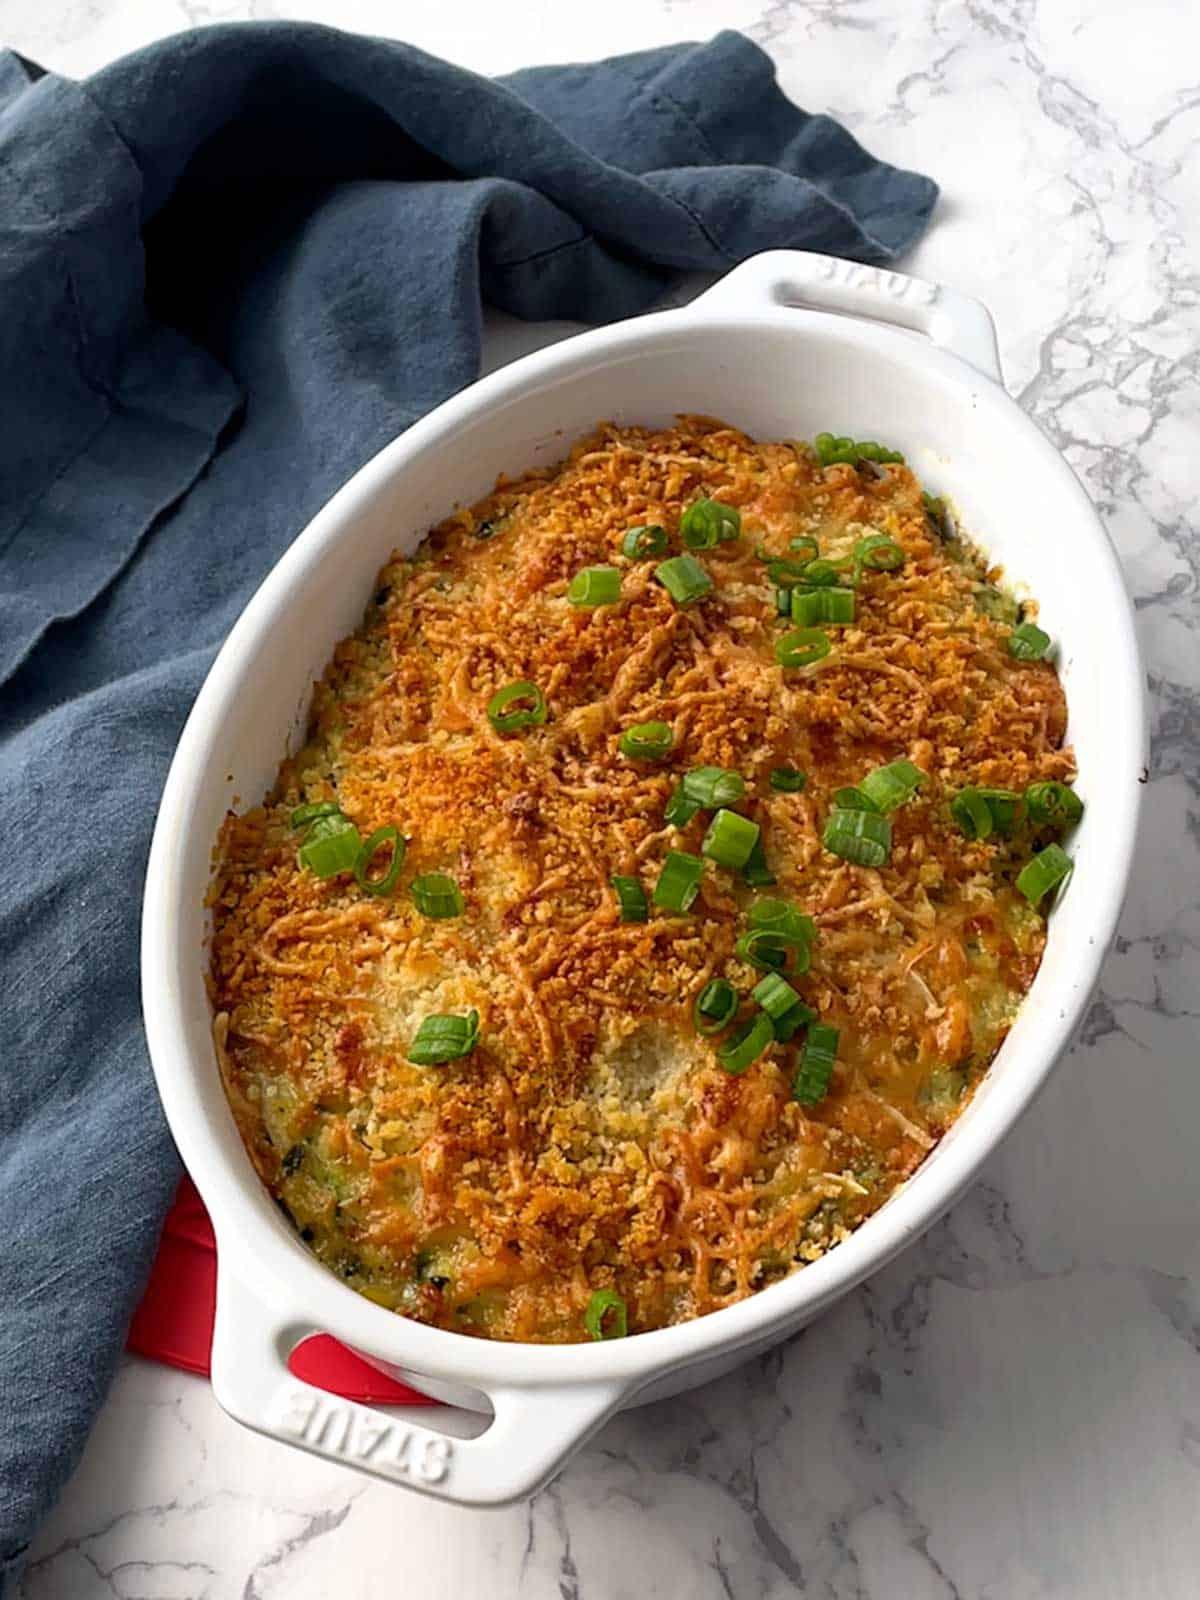 Easy make-ahead zucchini gratin